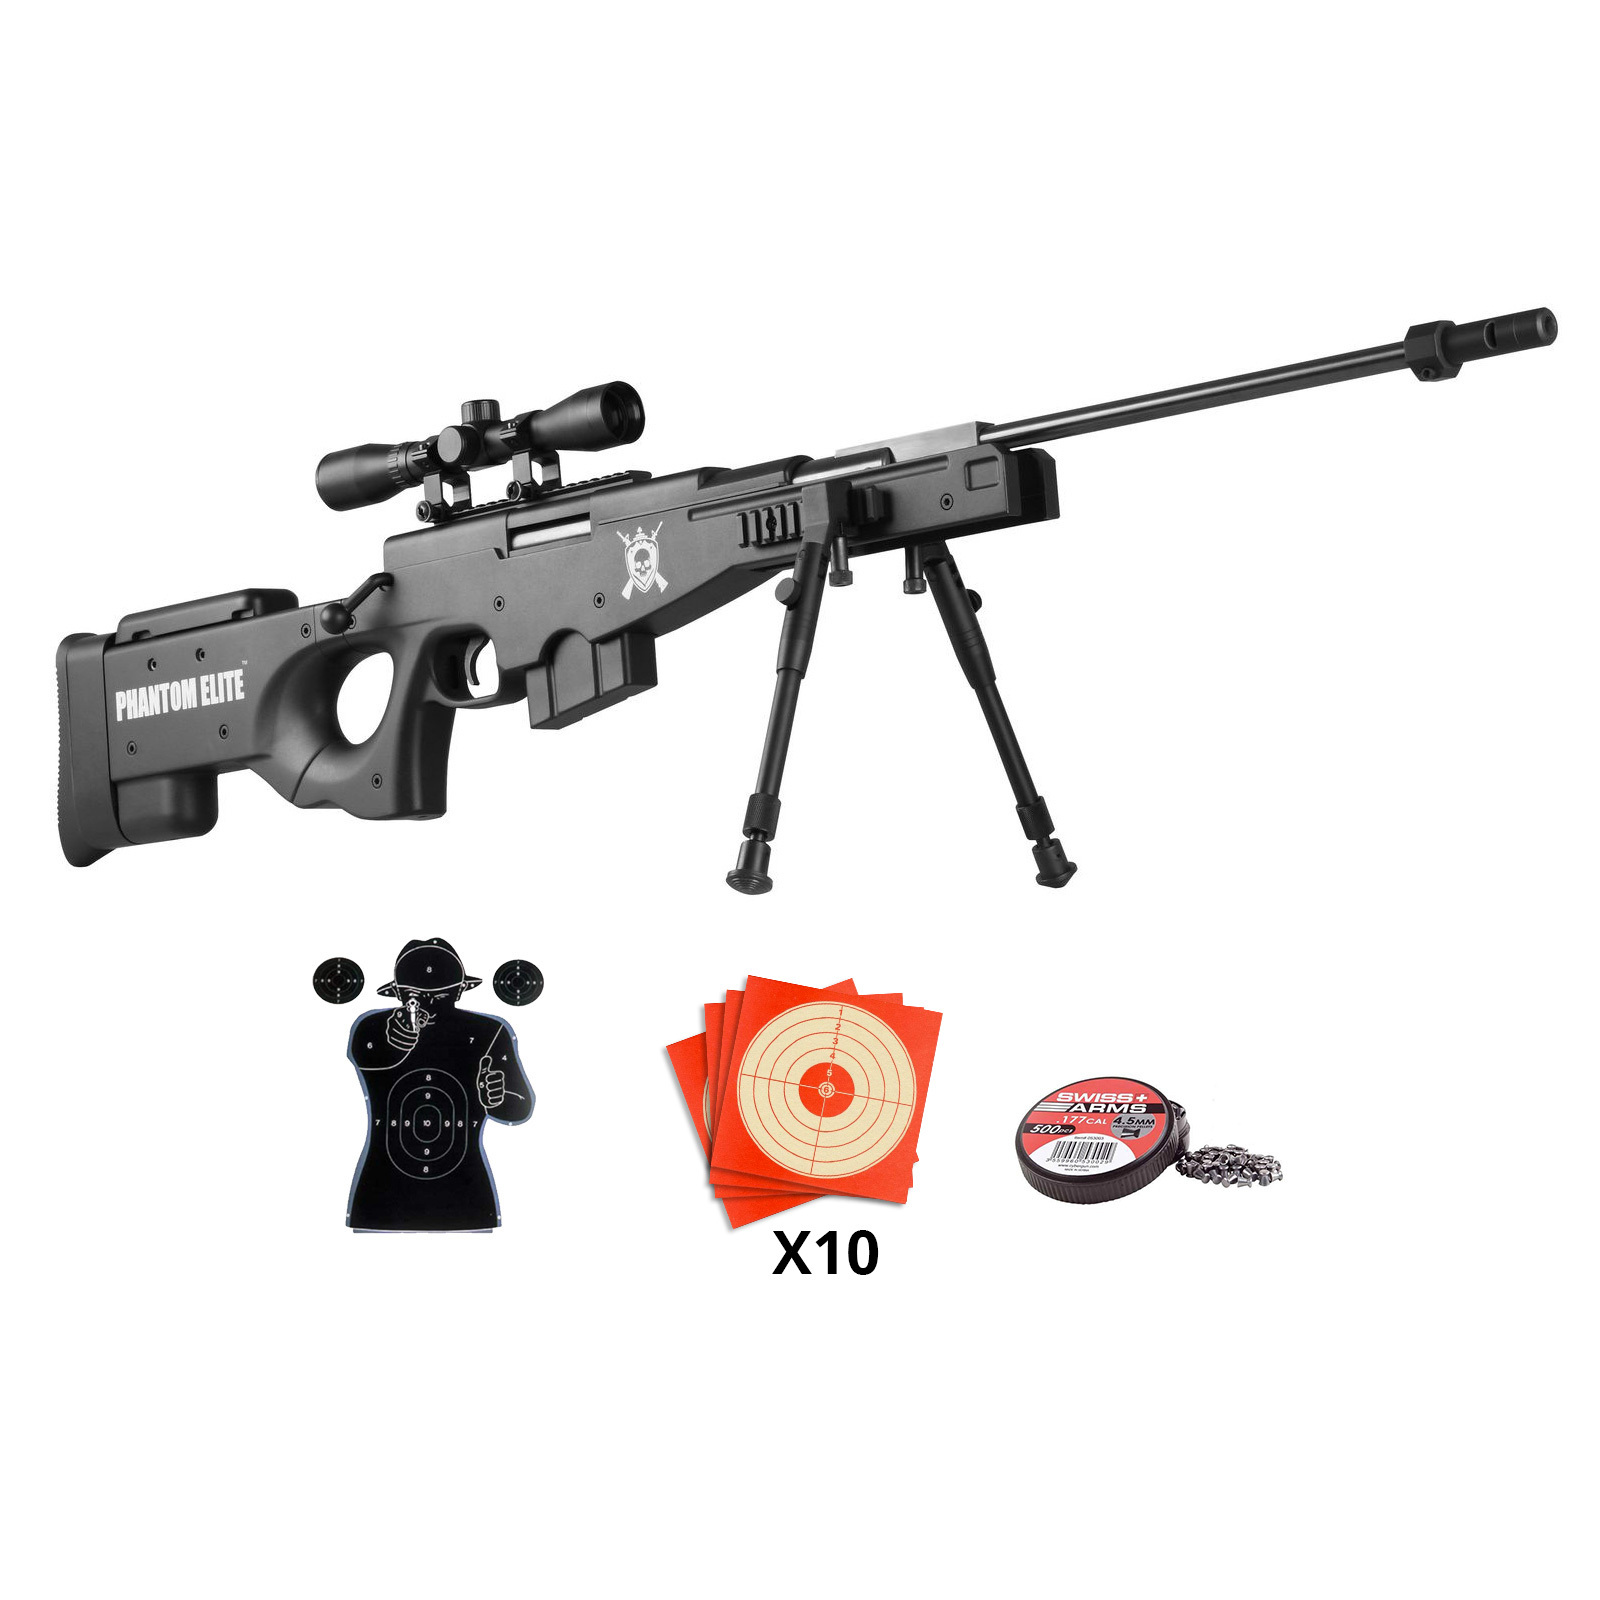 Pack carabine à plomb Sniper PHANTOM ELITE calibre 4,5 mm